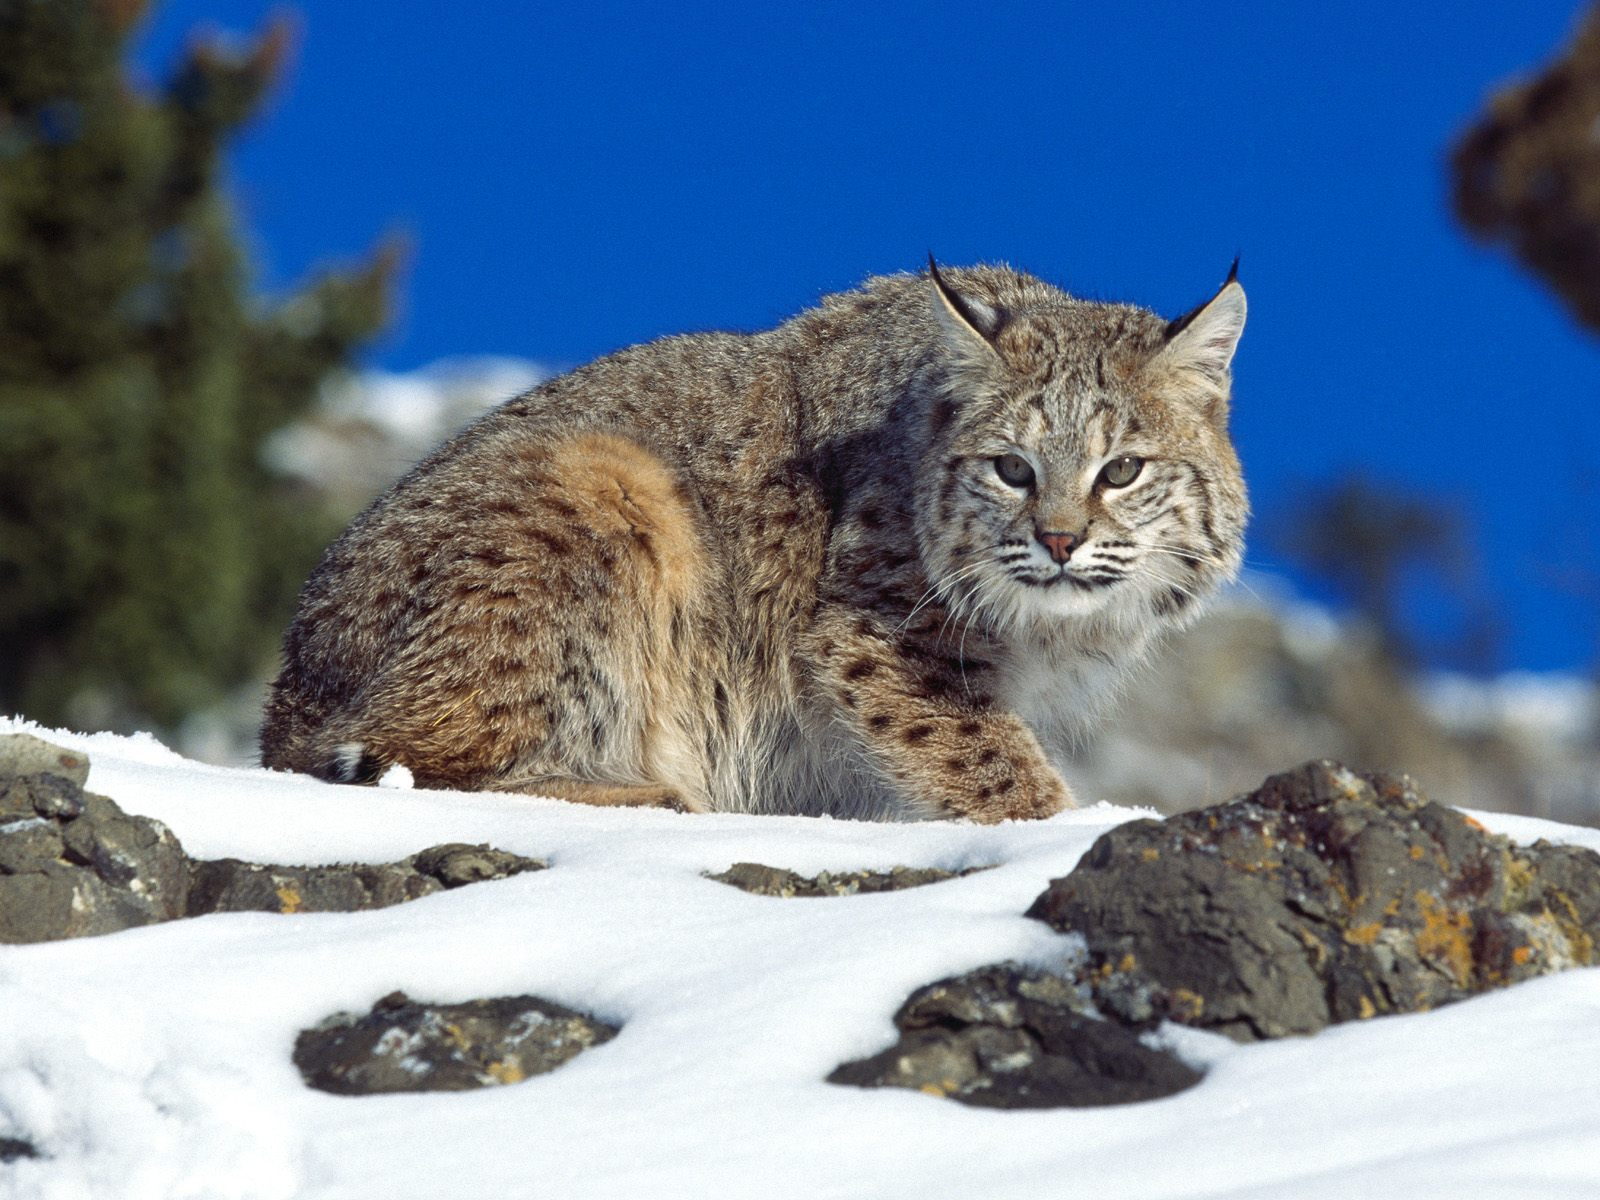 Bobcat View Full-Size Image